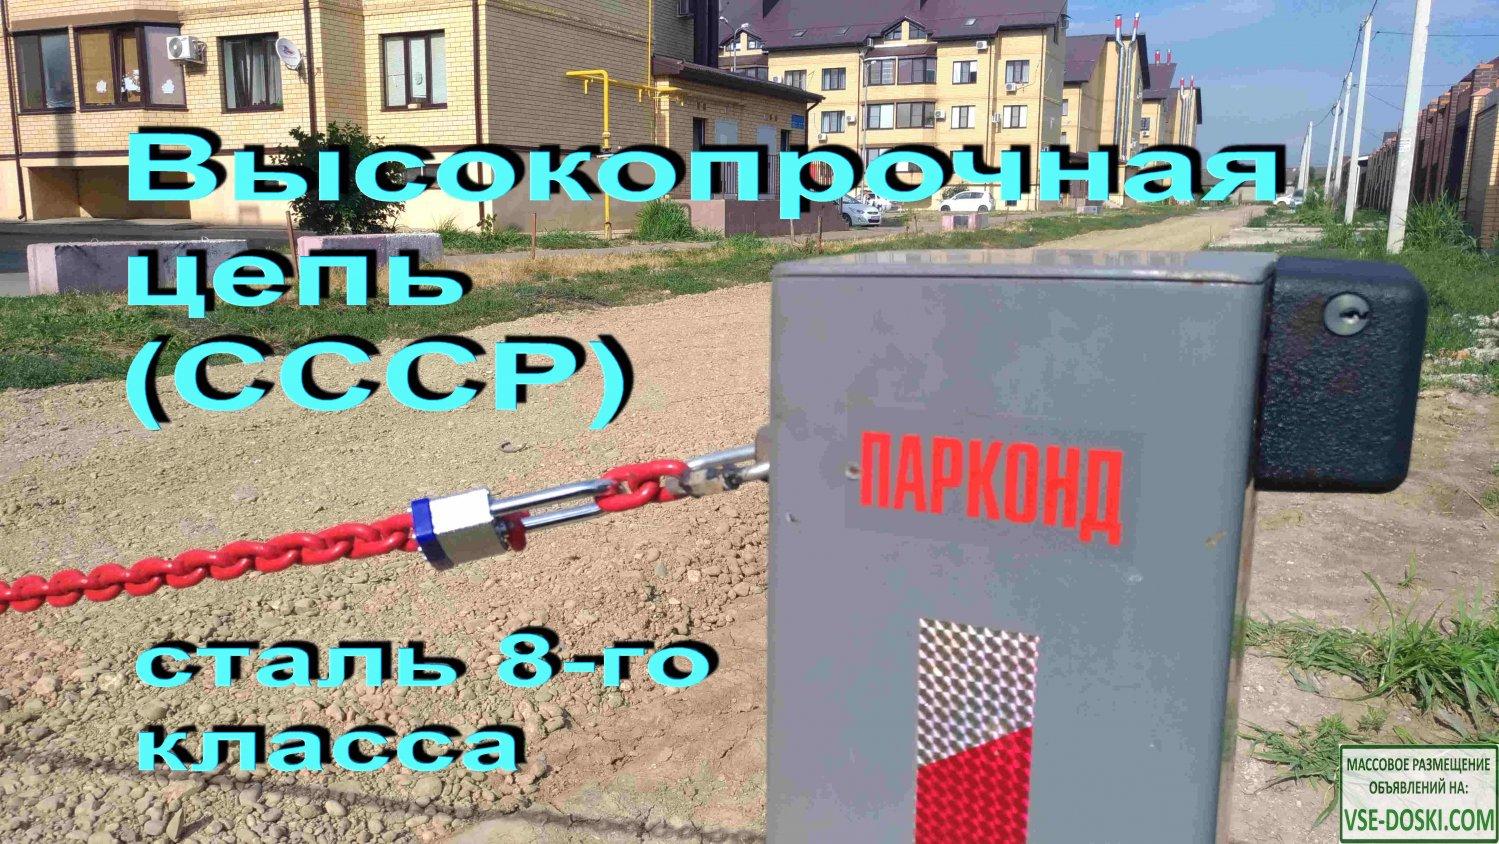 цепной шлагбаум барьер Парконд (12V/GSM)